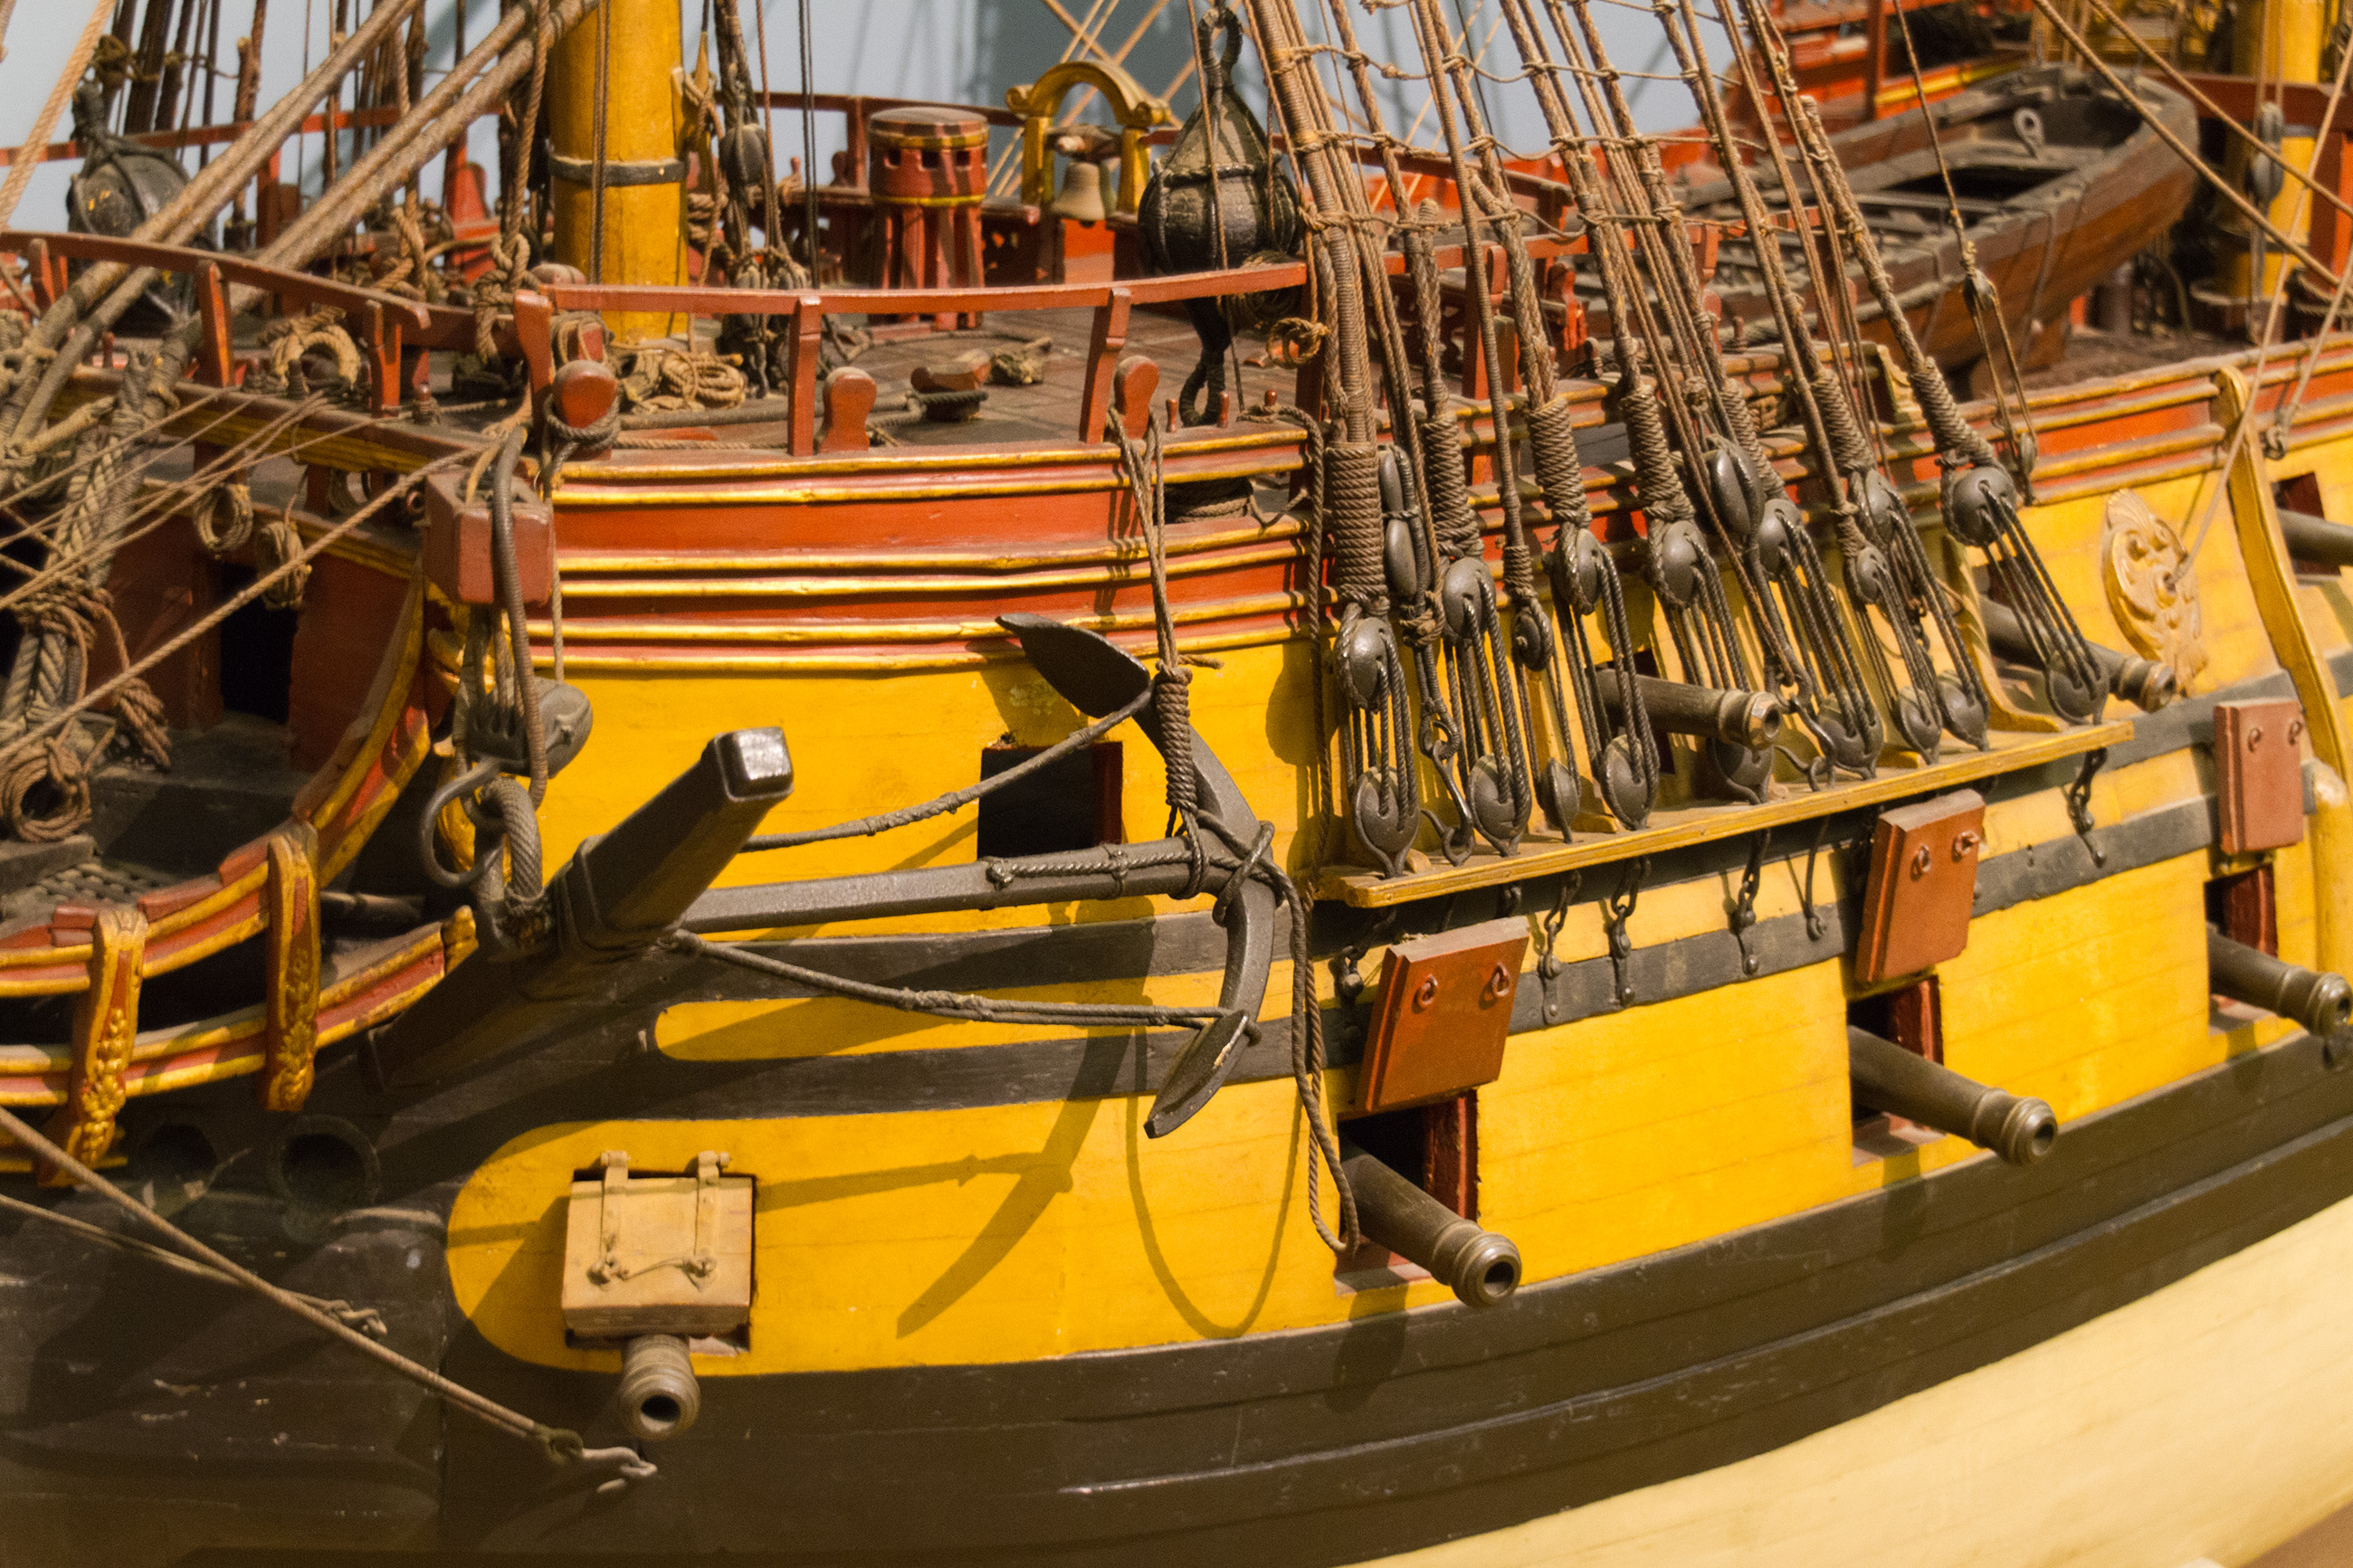 Ship, Sea, Sailer, Transport, Sailing, HQ Photo